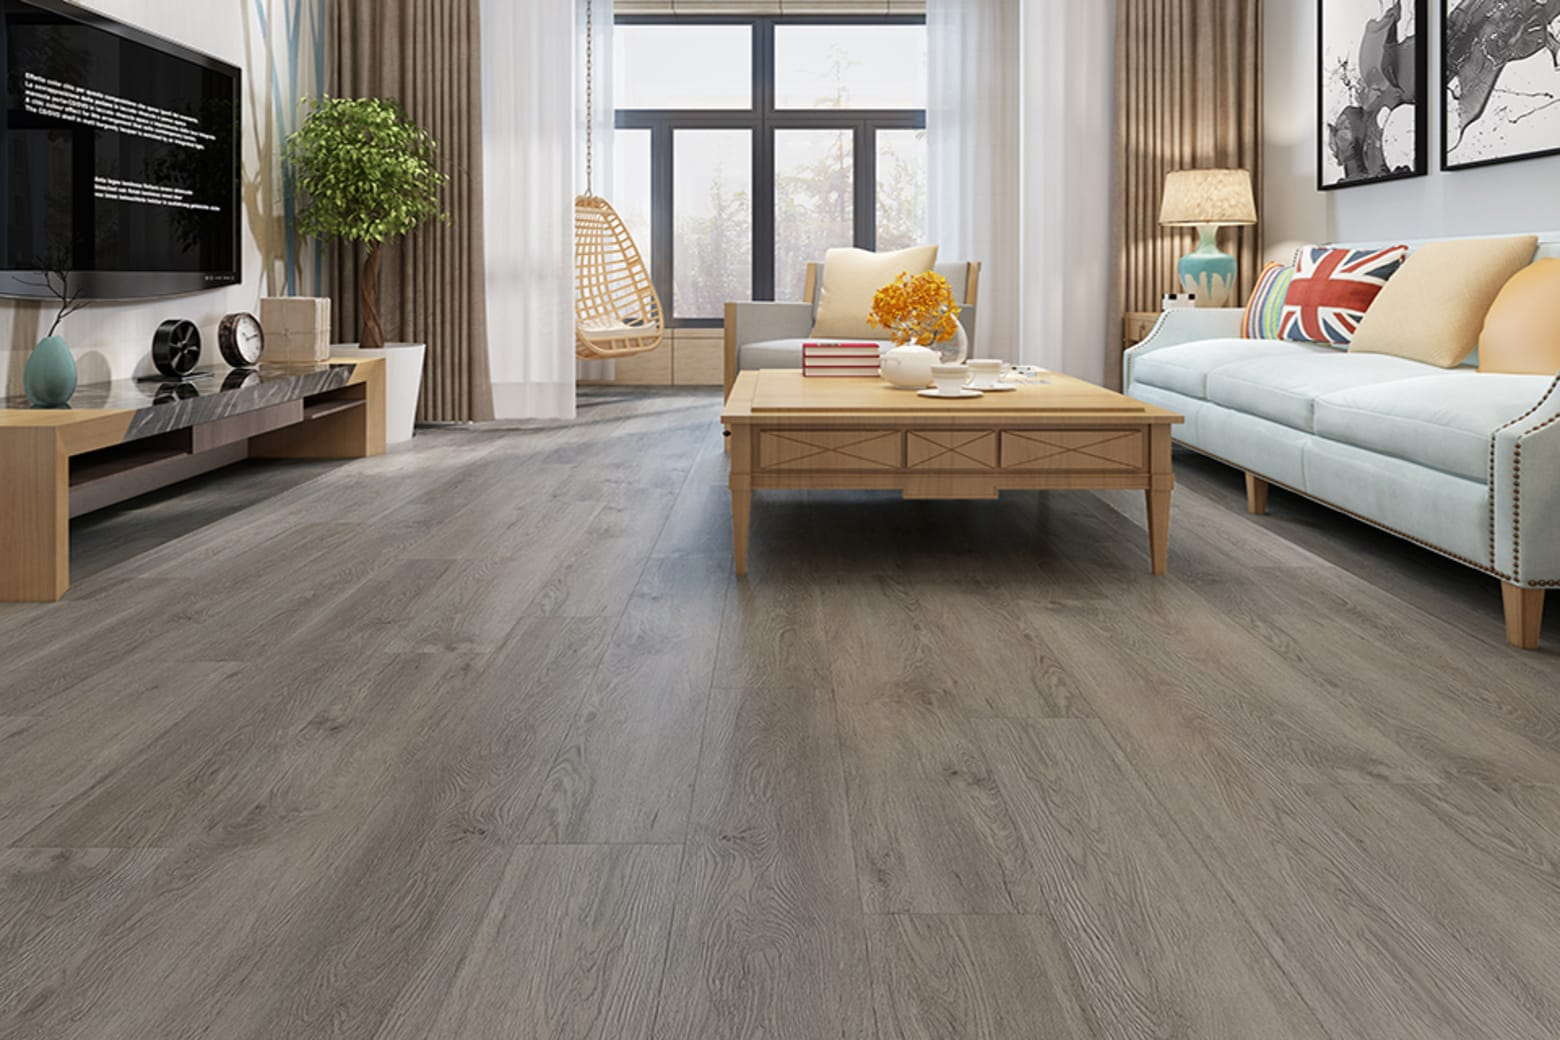 Grey Washed Wood Effect Waterproof Luxury Vinyl Click ... |Vinyl Click Flooring